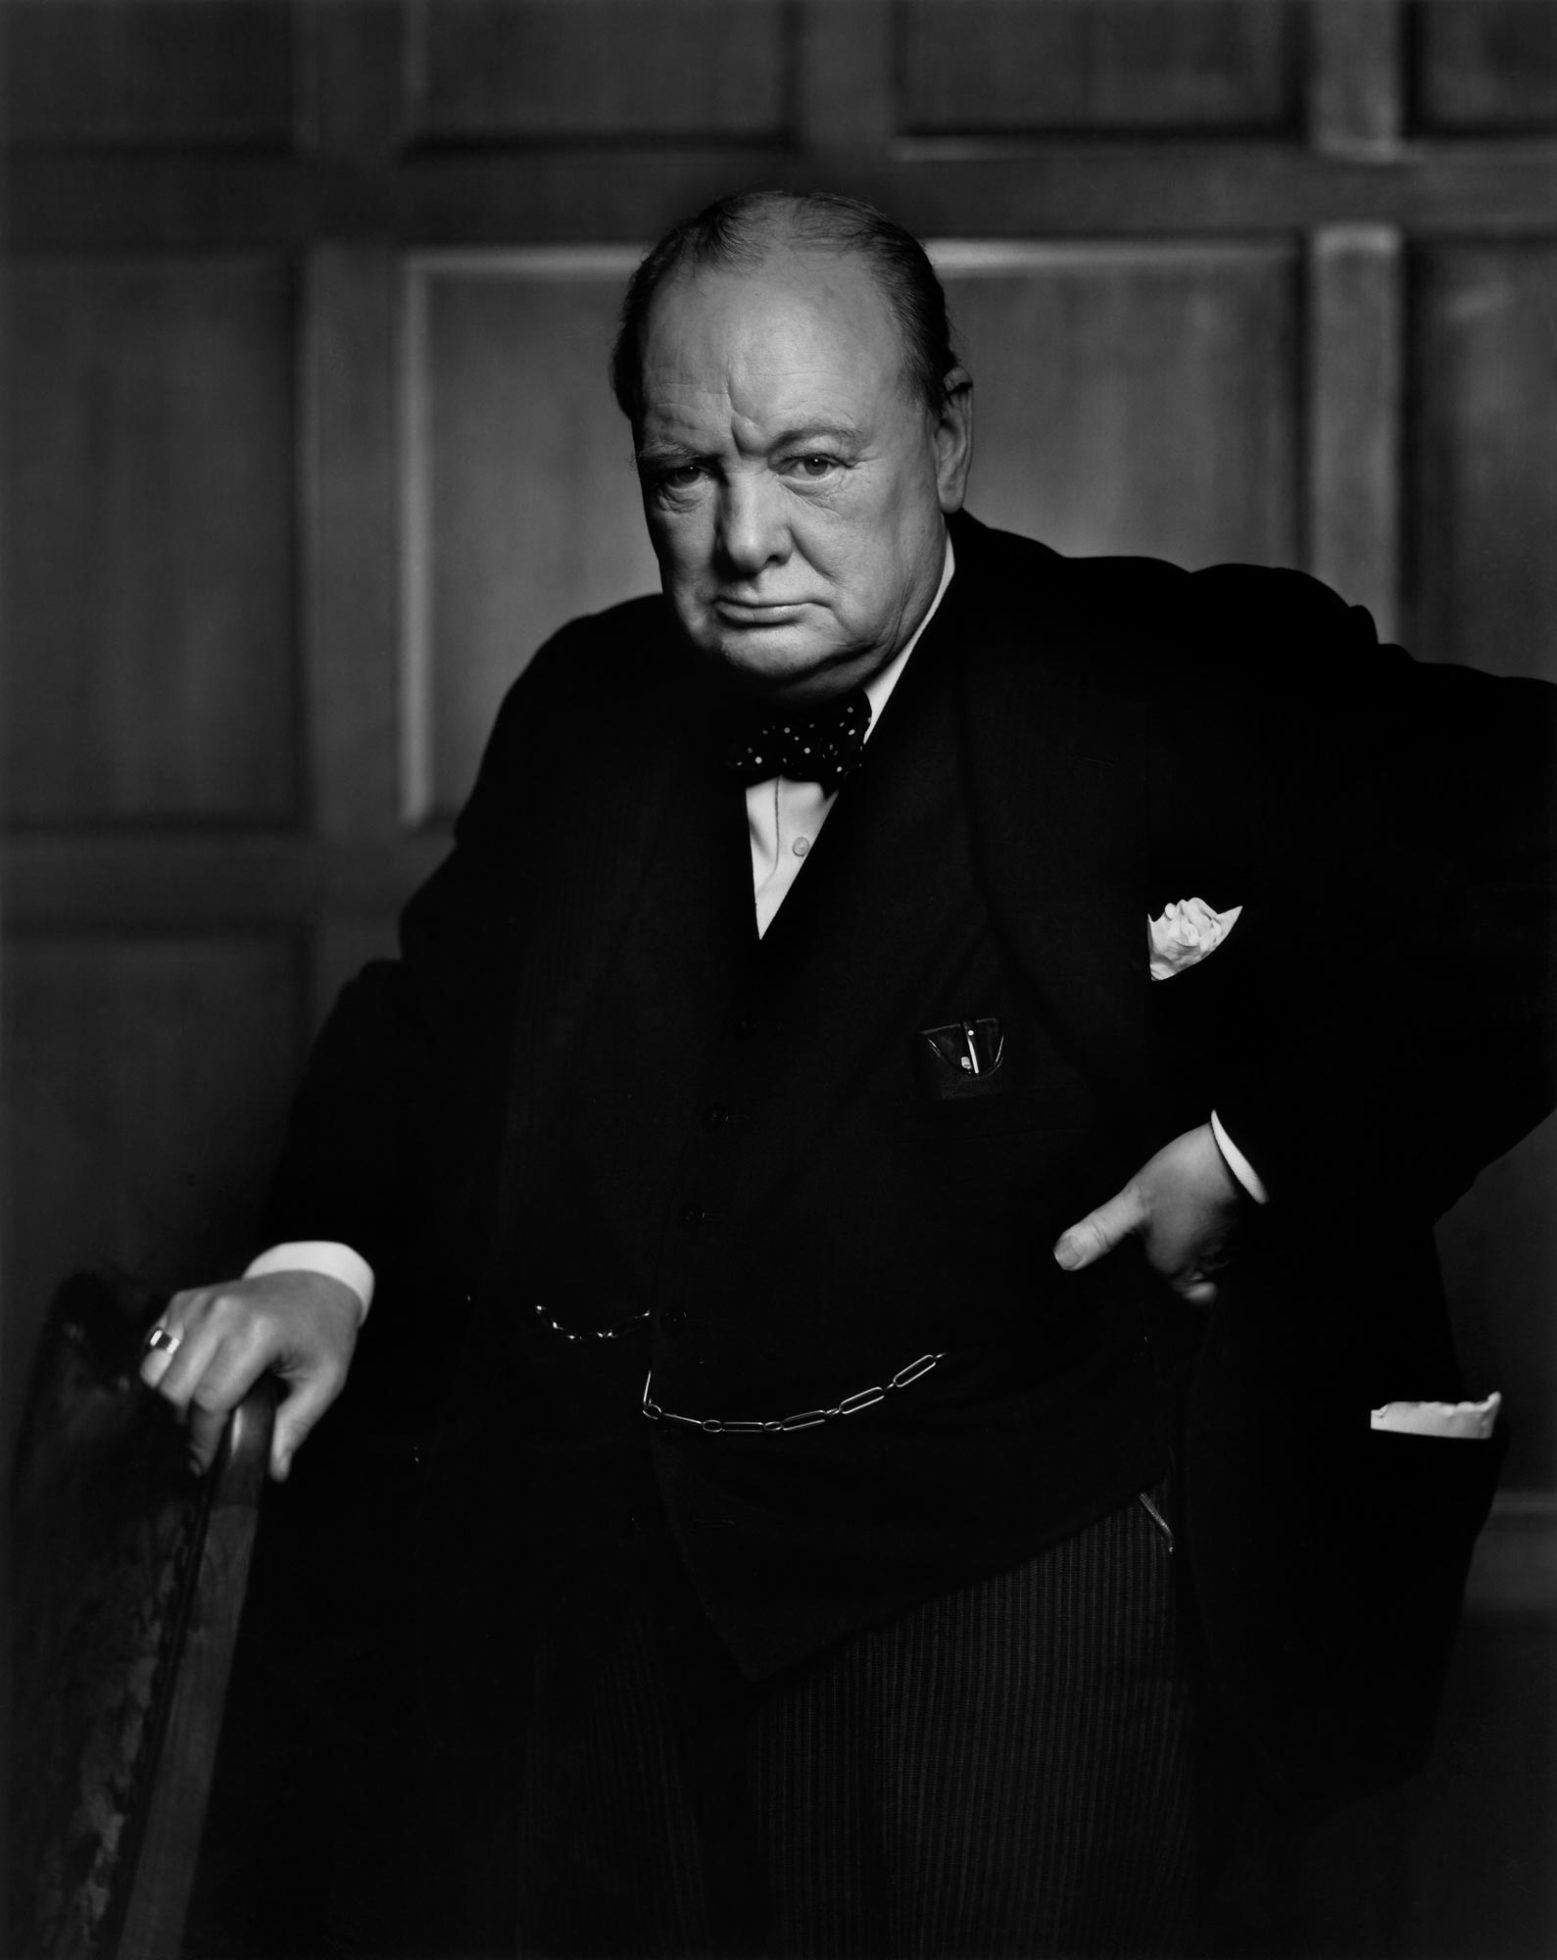 Winston Churchill Portrait Painting : winston, churchill, portrait, painting, Winston, Churchill, Yousuf, Karsh